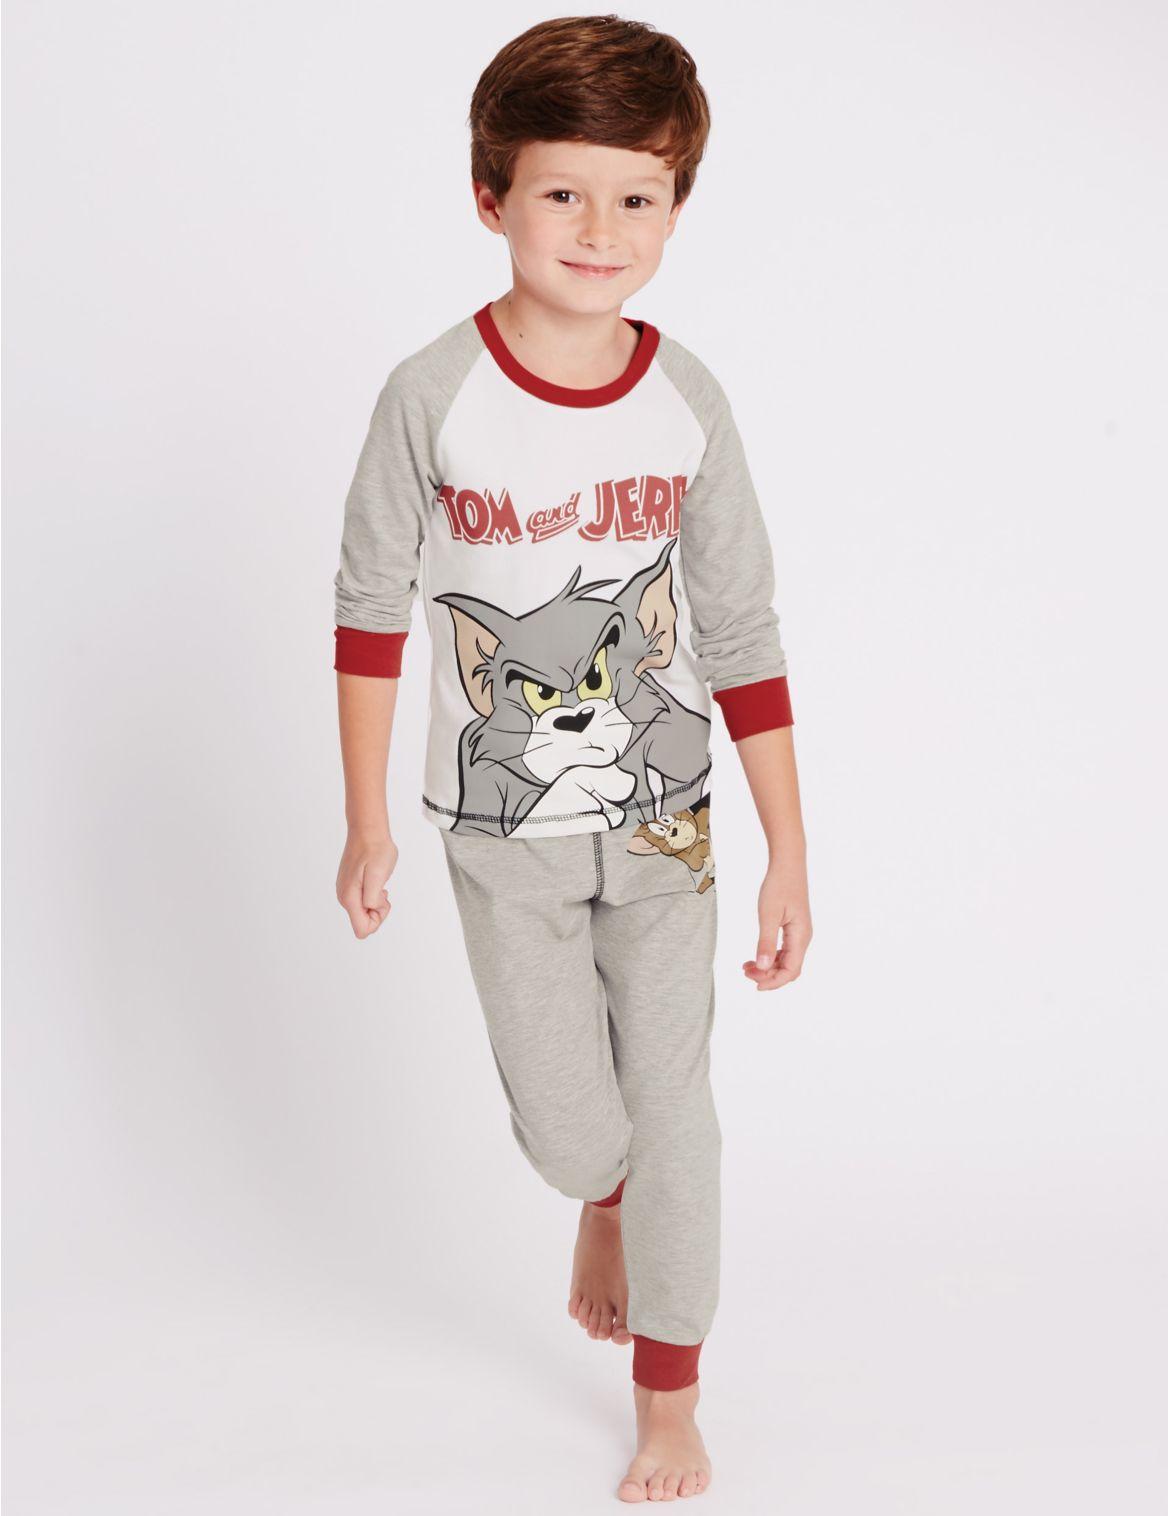 Pyjama met lange mouwen en Tom en